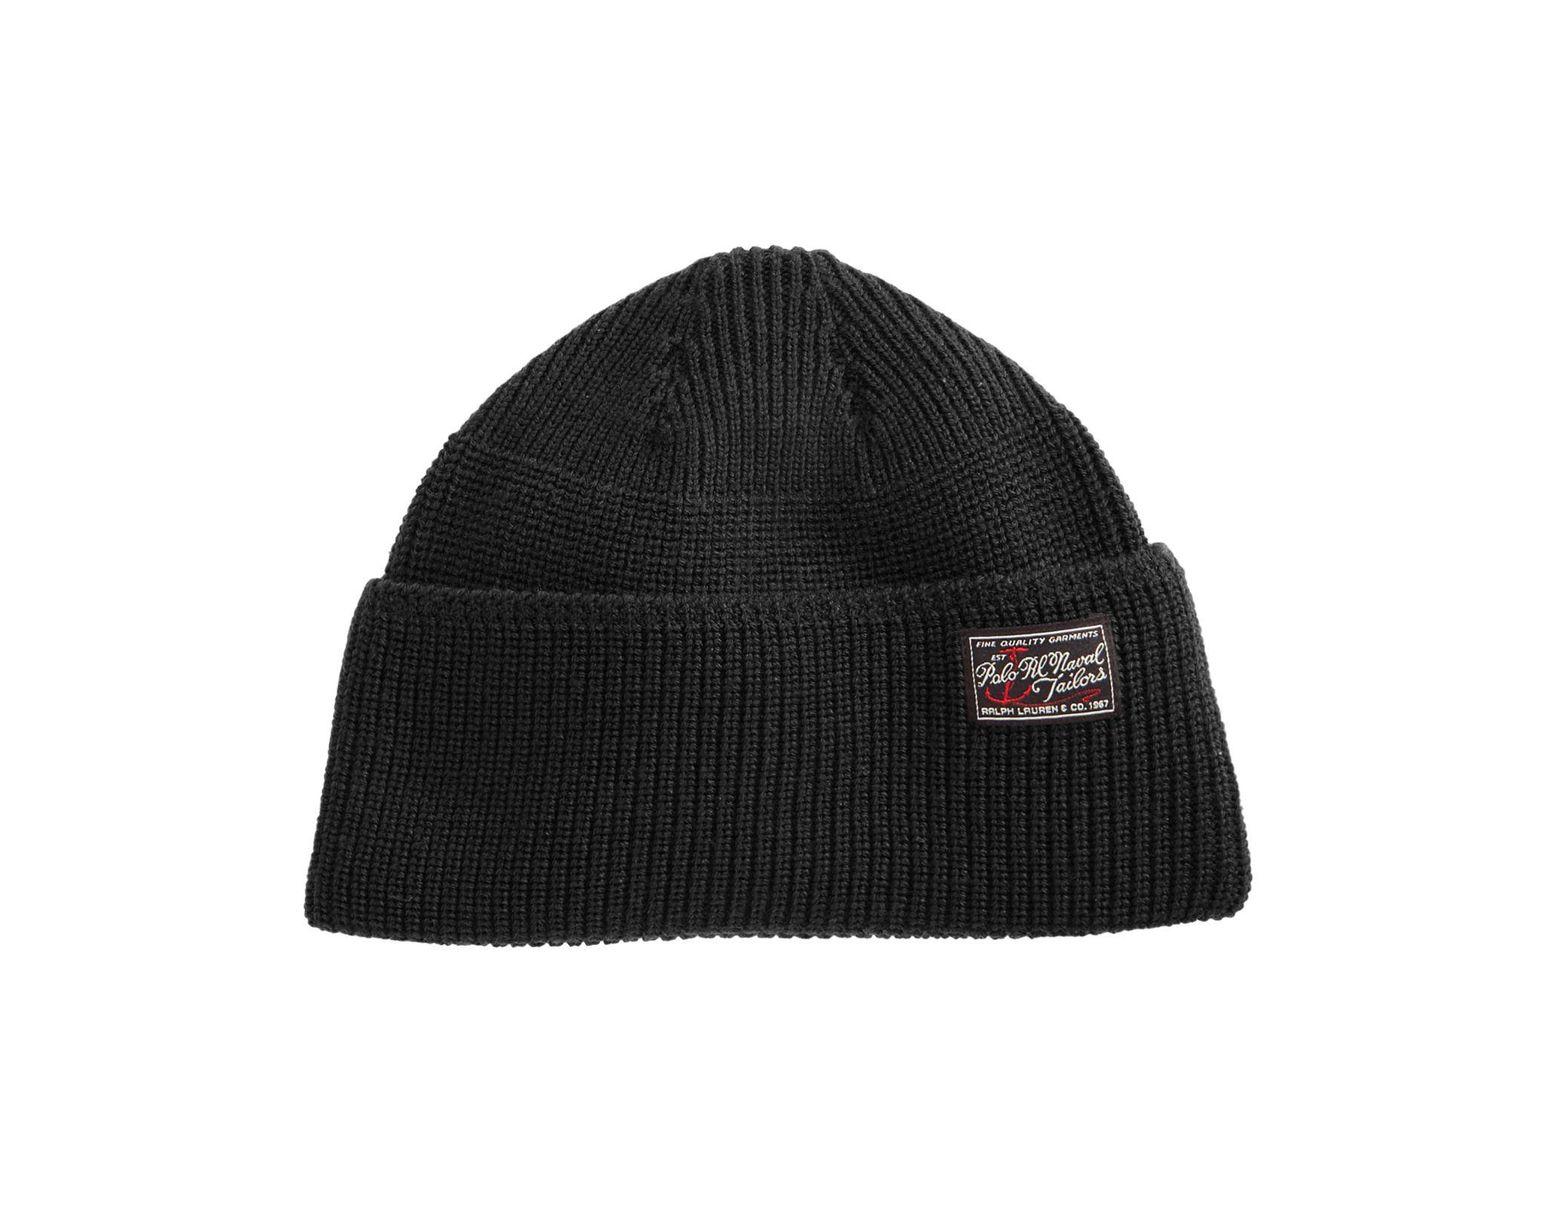 1507c26a5 Men's Black Wool Naval Watch Hat